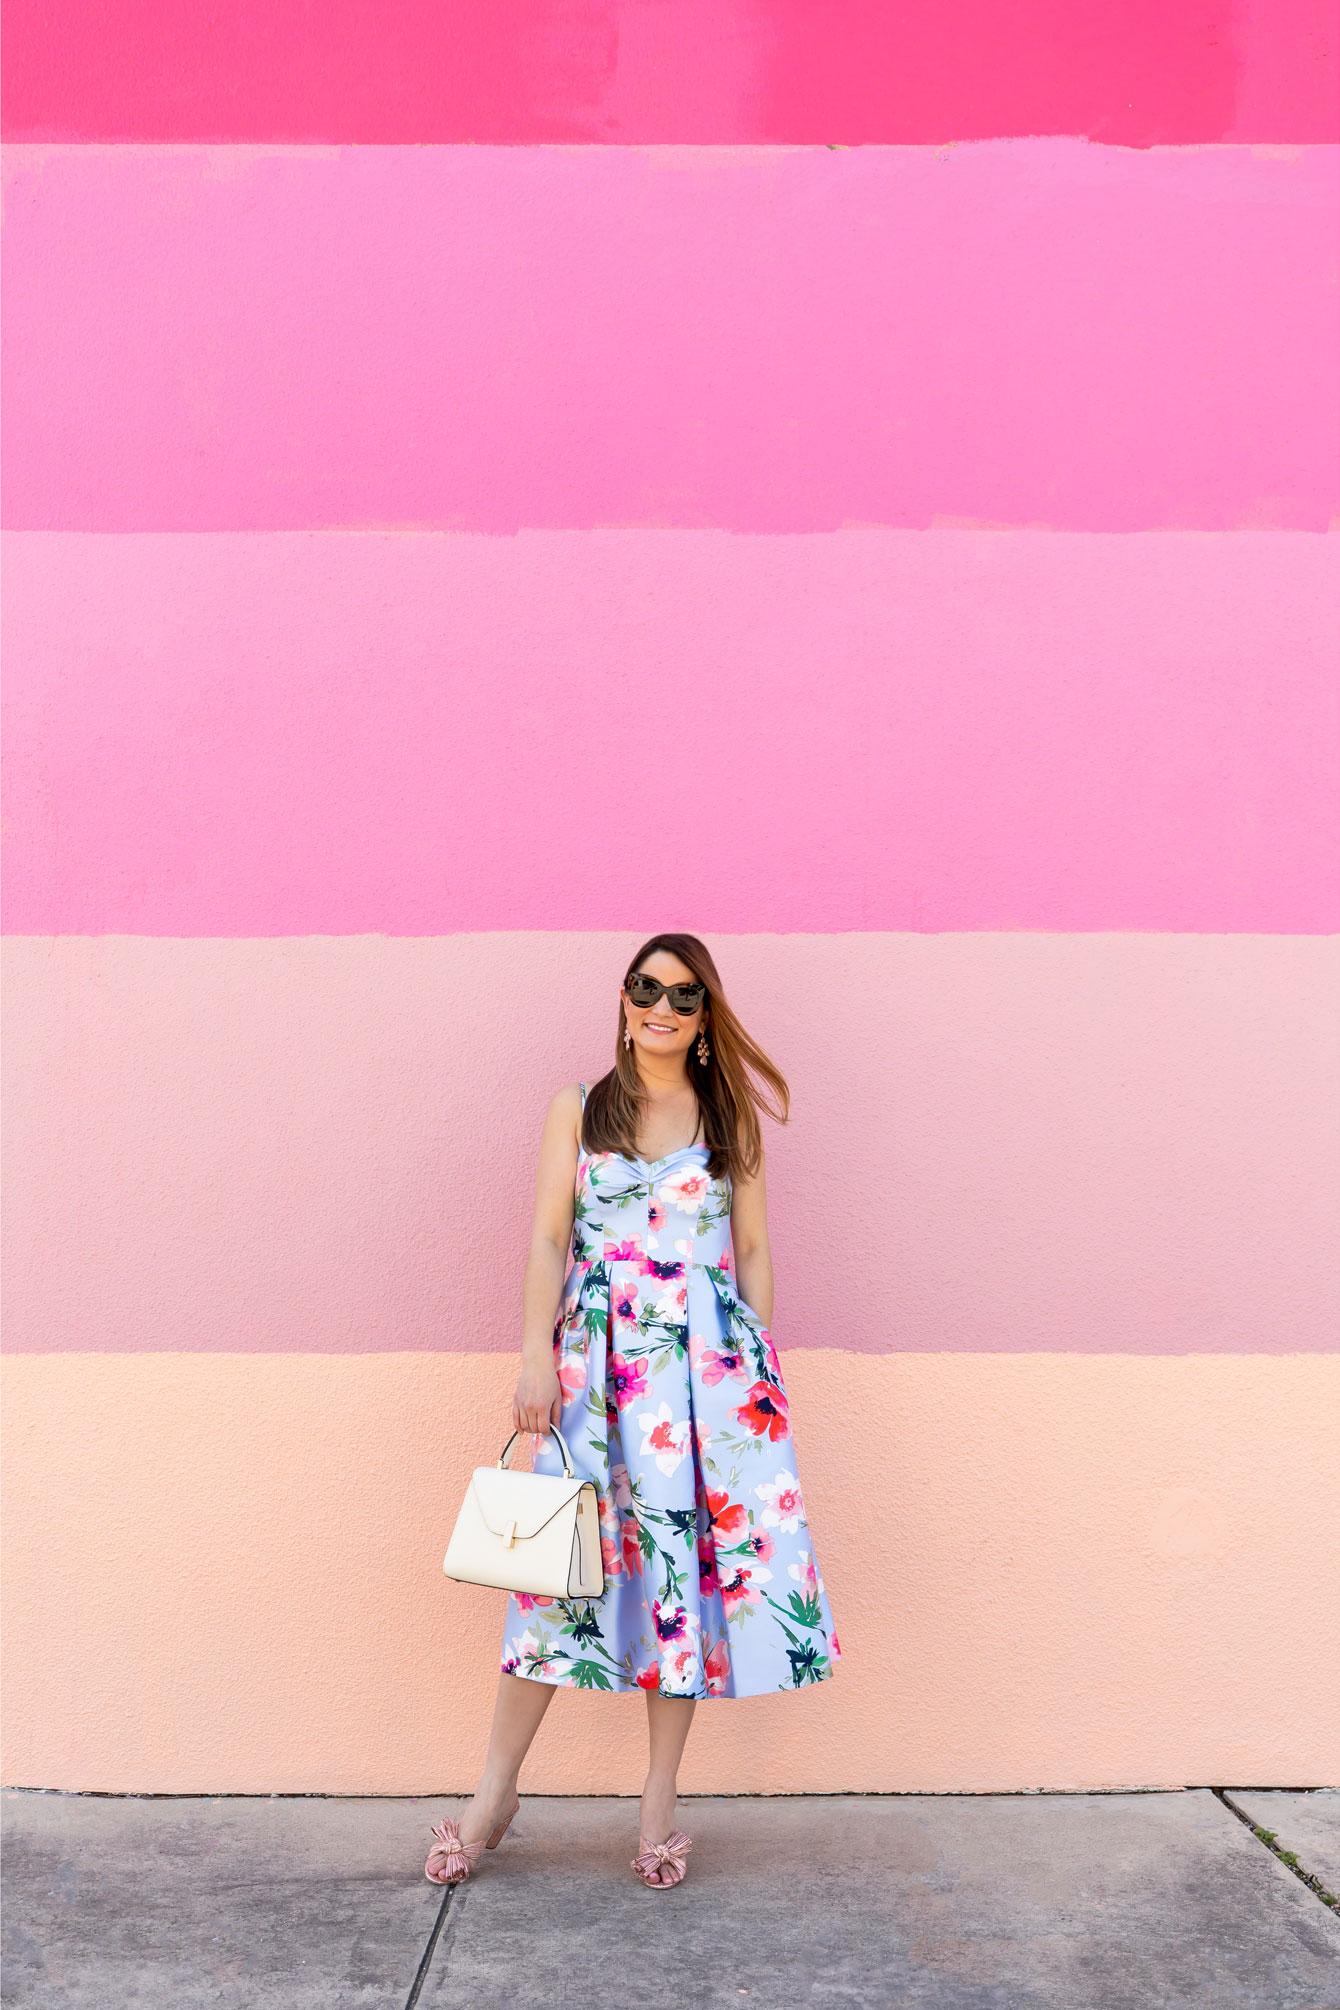 Pink Wall Austin